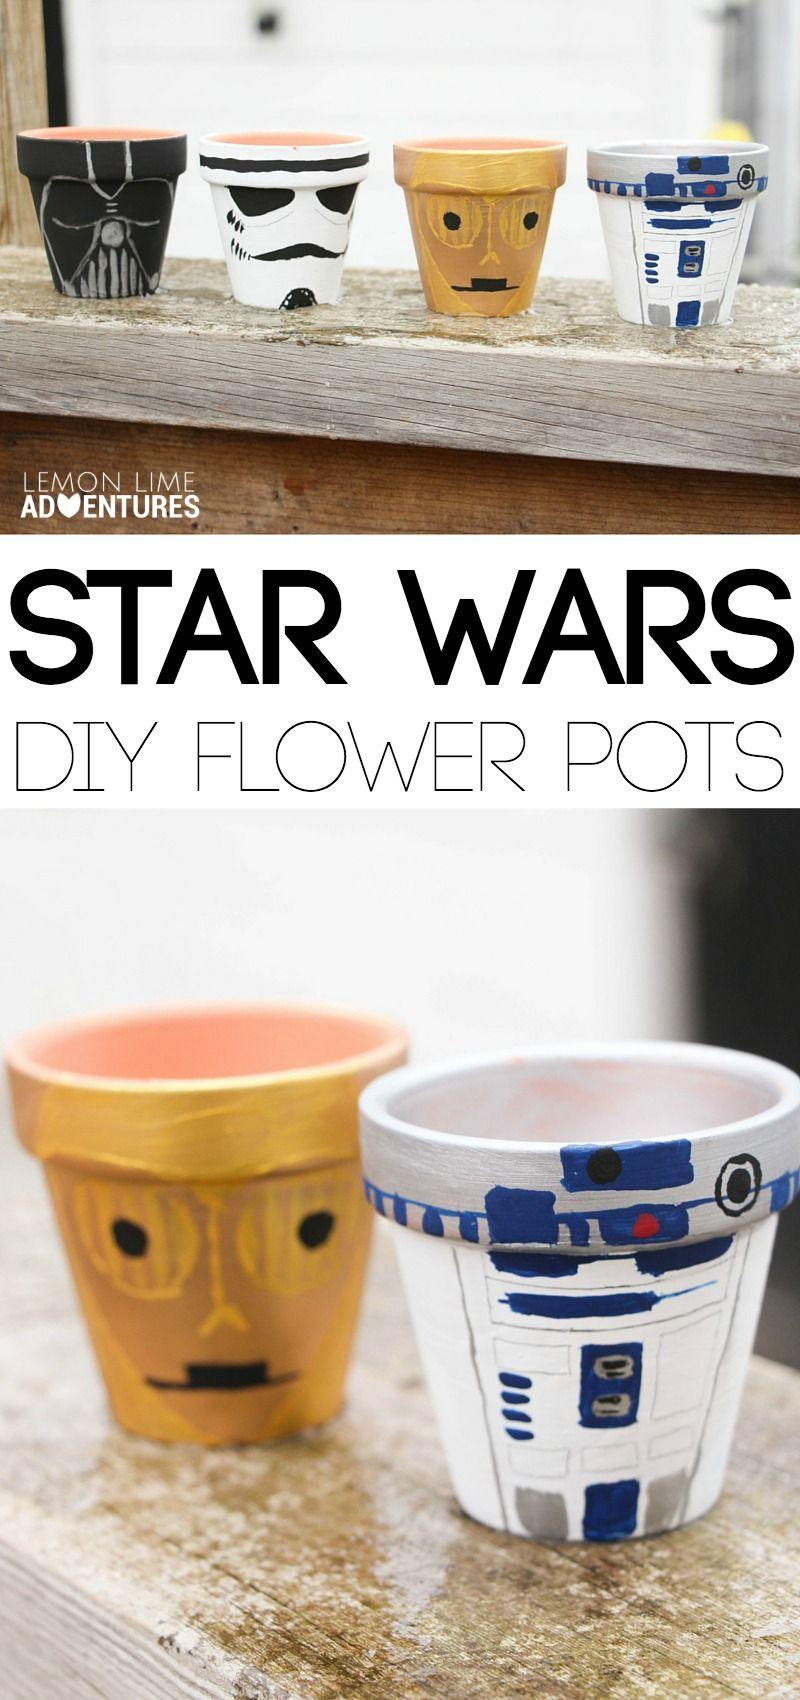 diy star wars garden pots garden pots darth vader and tutorials. Black Bedroom Furniture Sets. Home Design Ideas